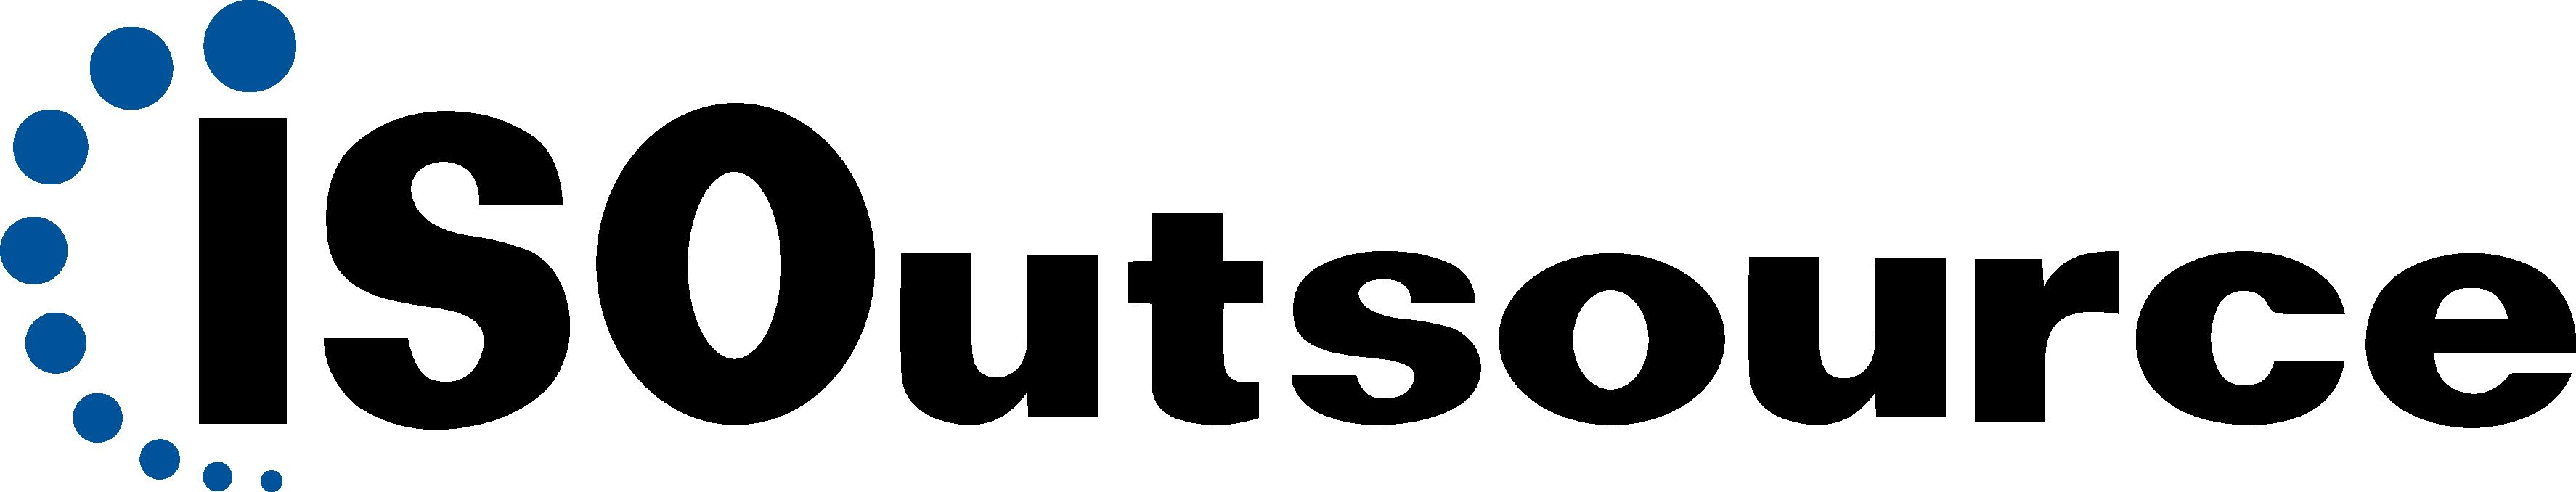 ISOutsource Logo